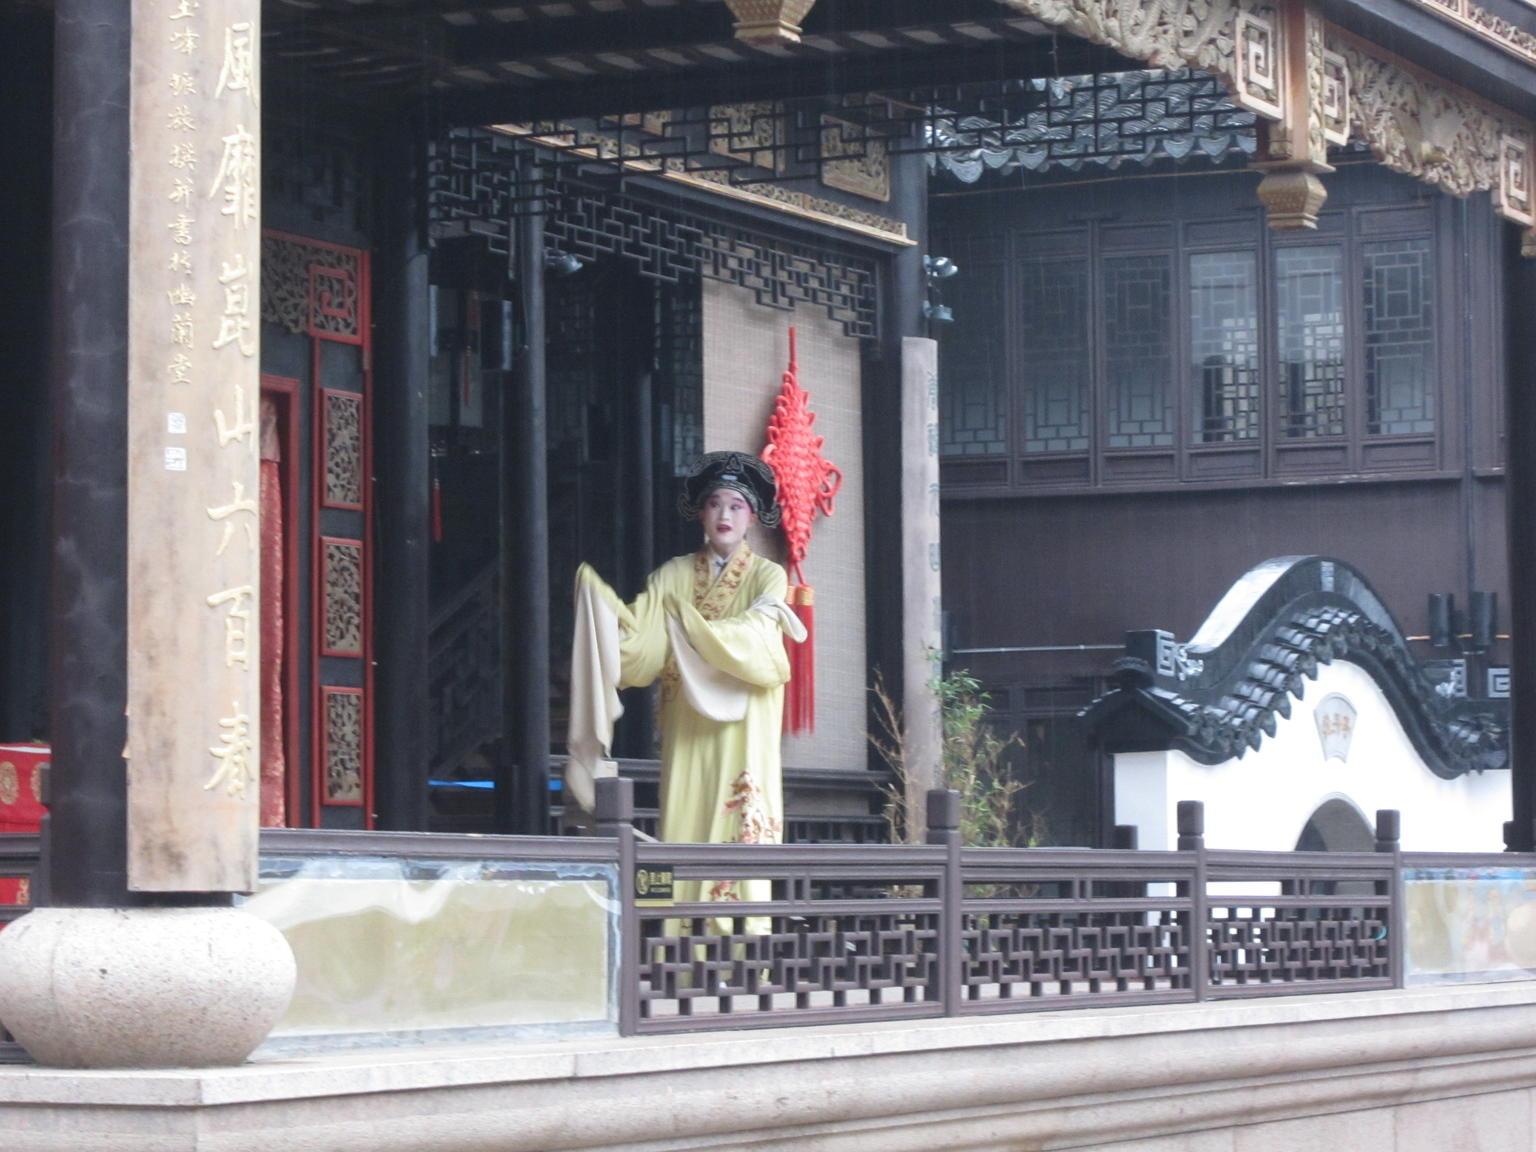 MÁS FOTOS, Mini Group: One-Day Zhouzhuang and Jinxi Water Town Tour